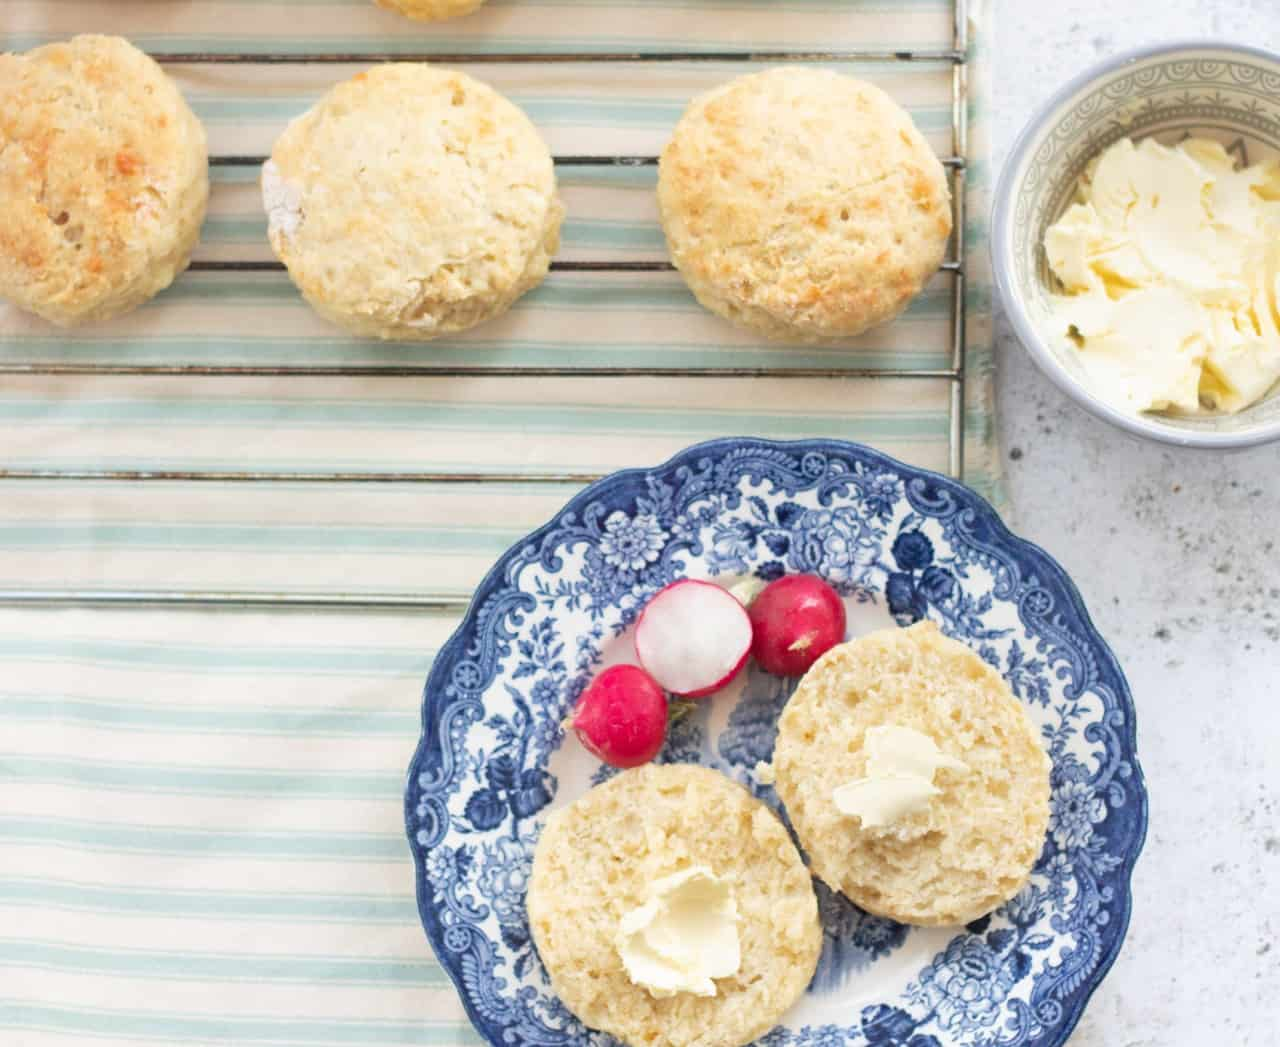 How to Make Easy Vegan Cheese Scones